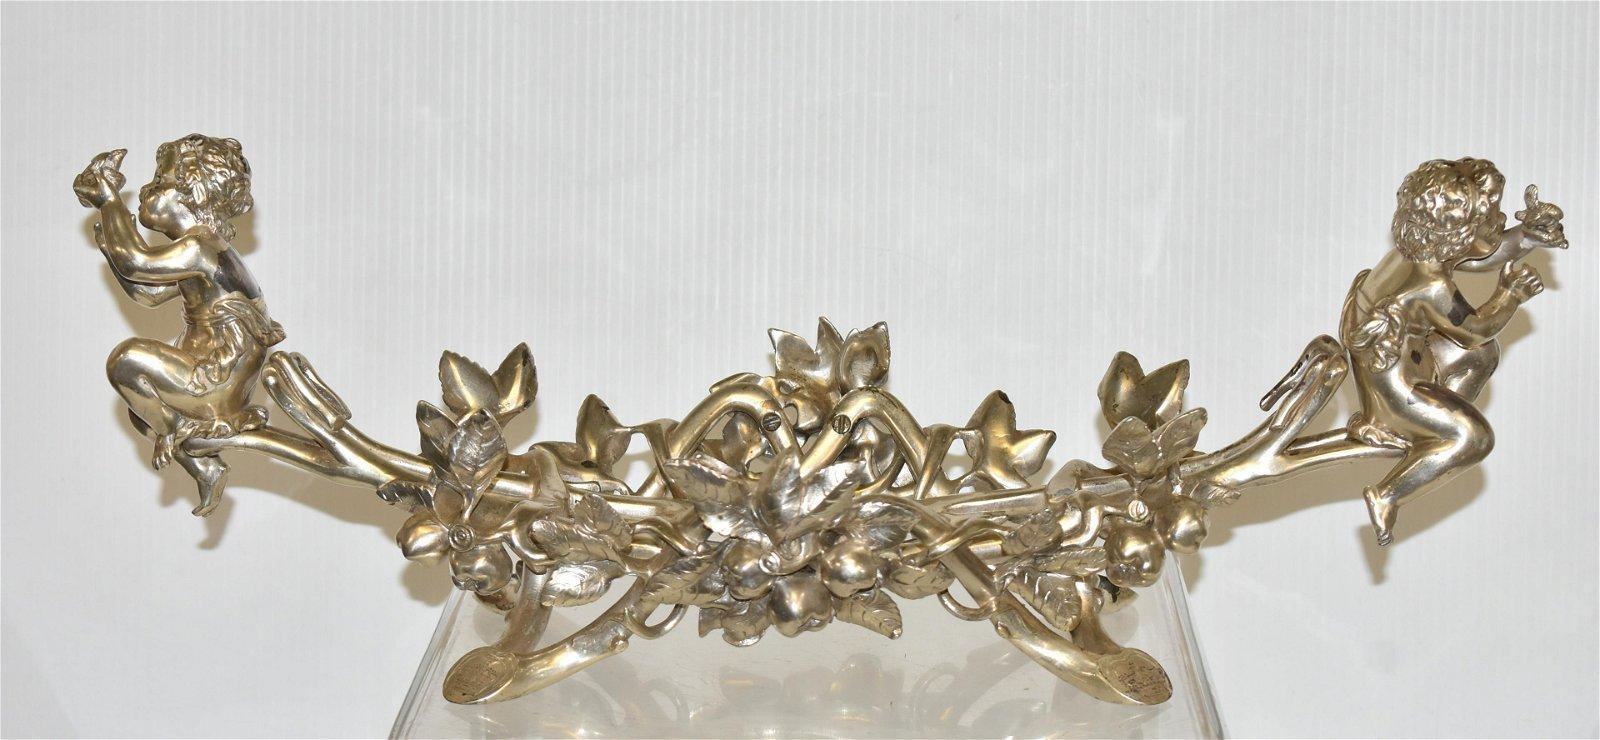 Art Nouveau Silver Plated Putti Fruit Bowl Holder